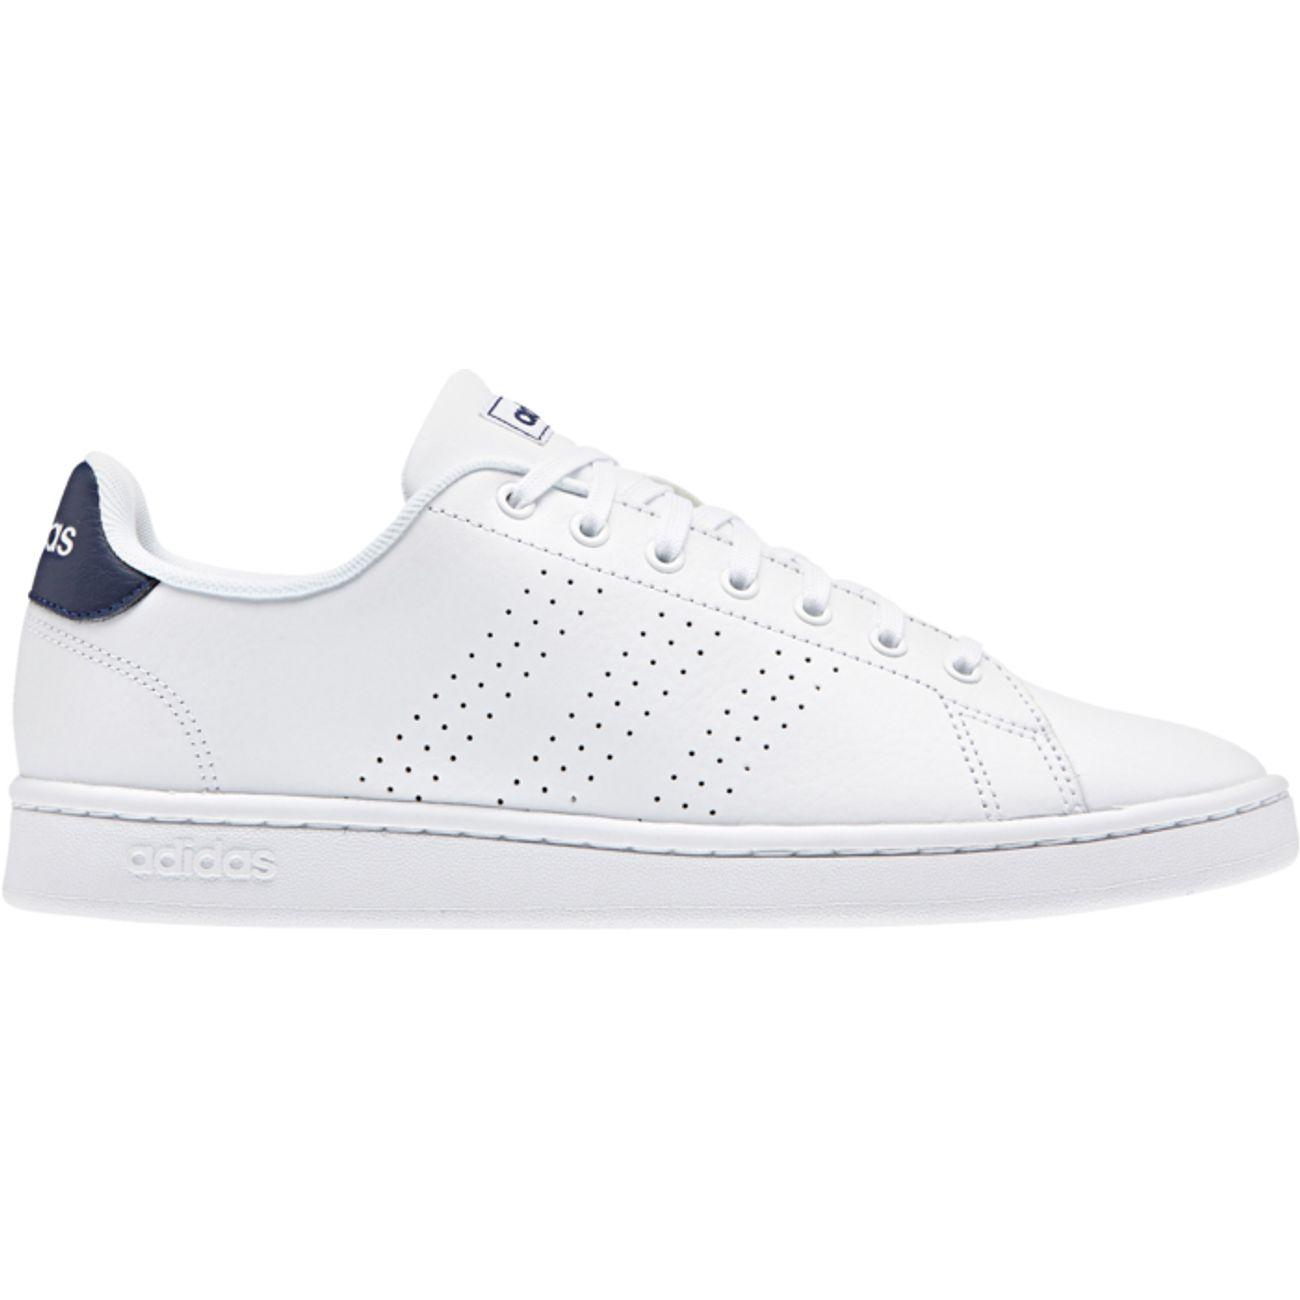 Marine 1f3lcuk5tj Chaussures Homme Adidas Basses Tennis Advantageblanc BdCxoe